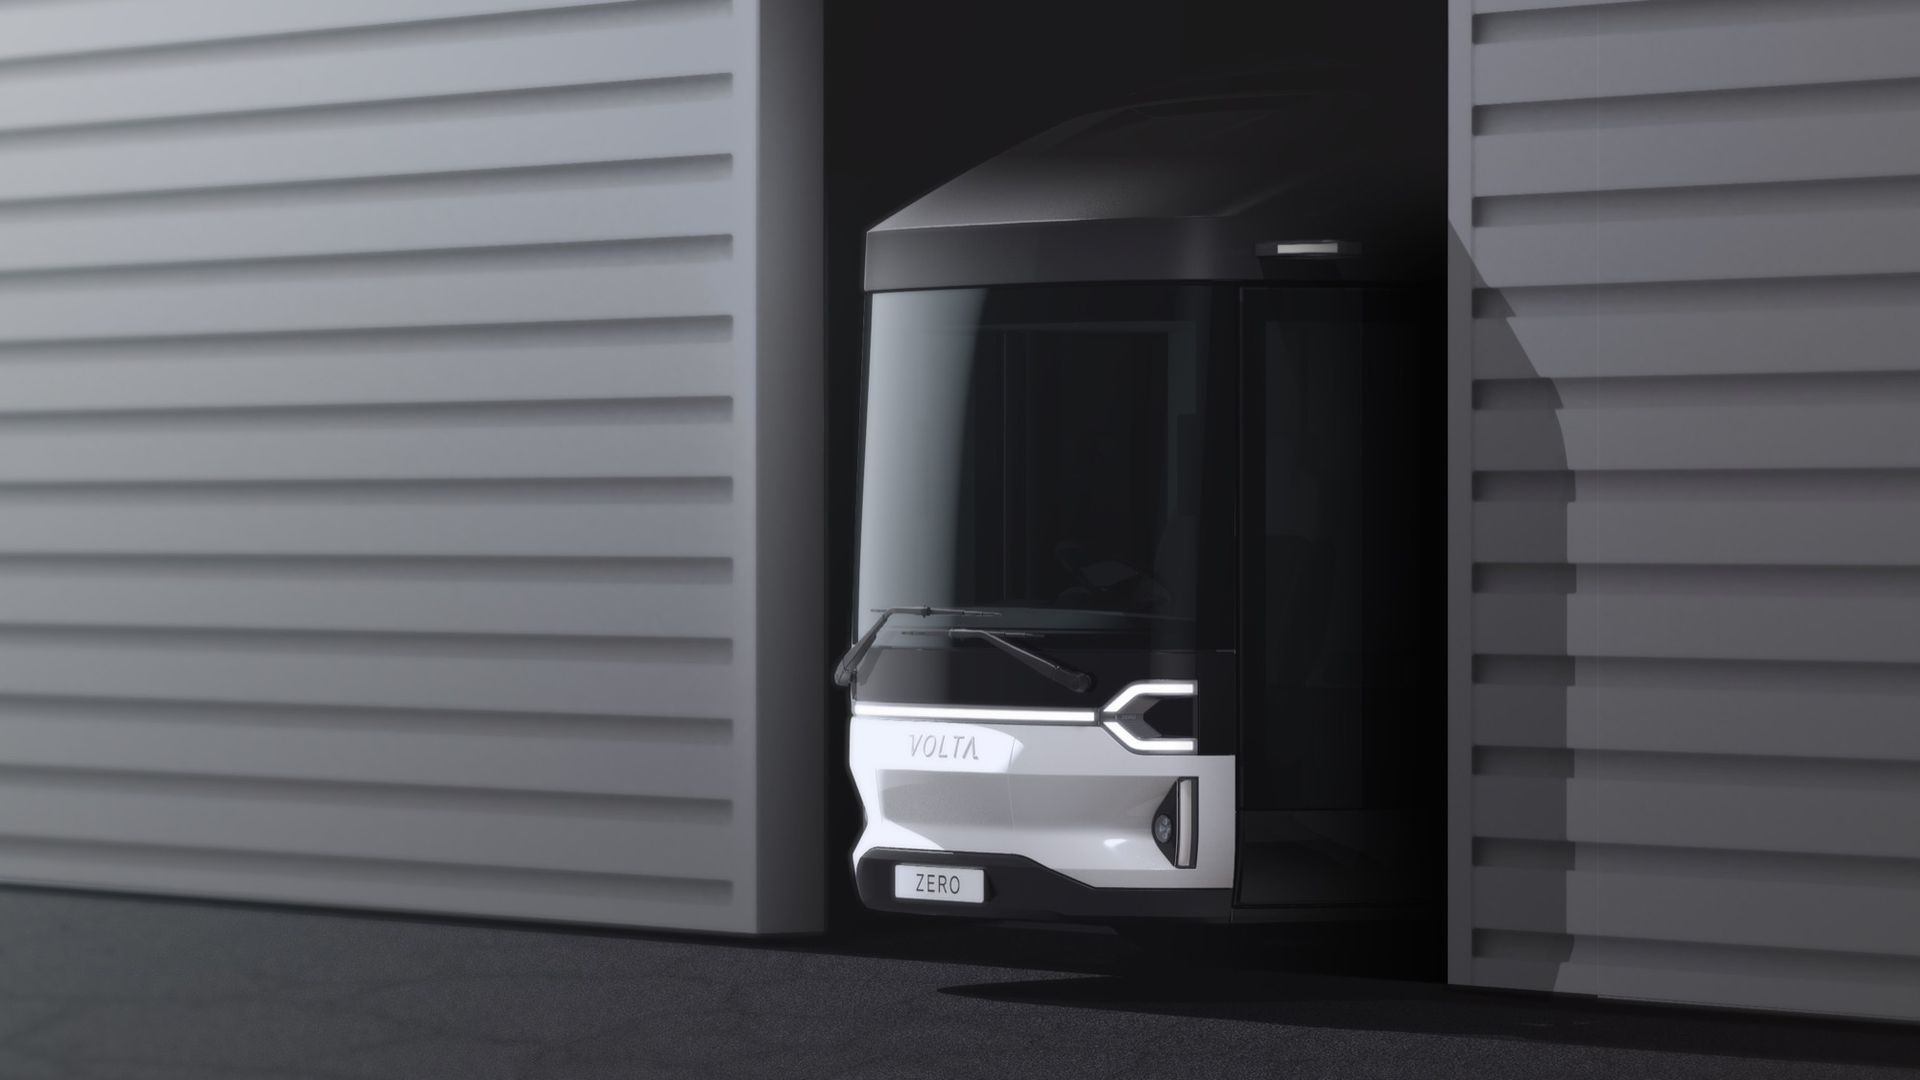 Voltas eldrivna lastbil Zero presenteras den 3 september